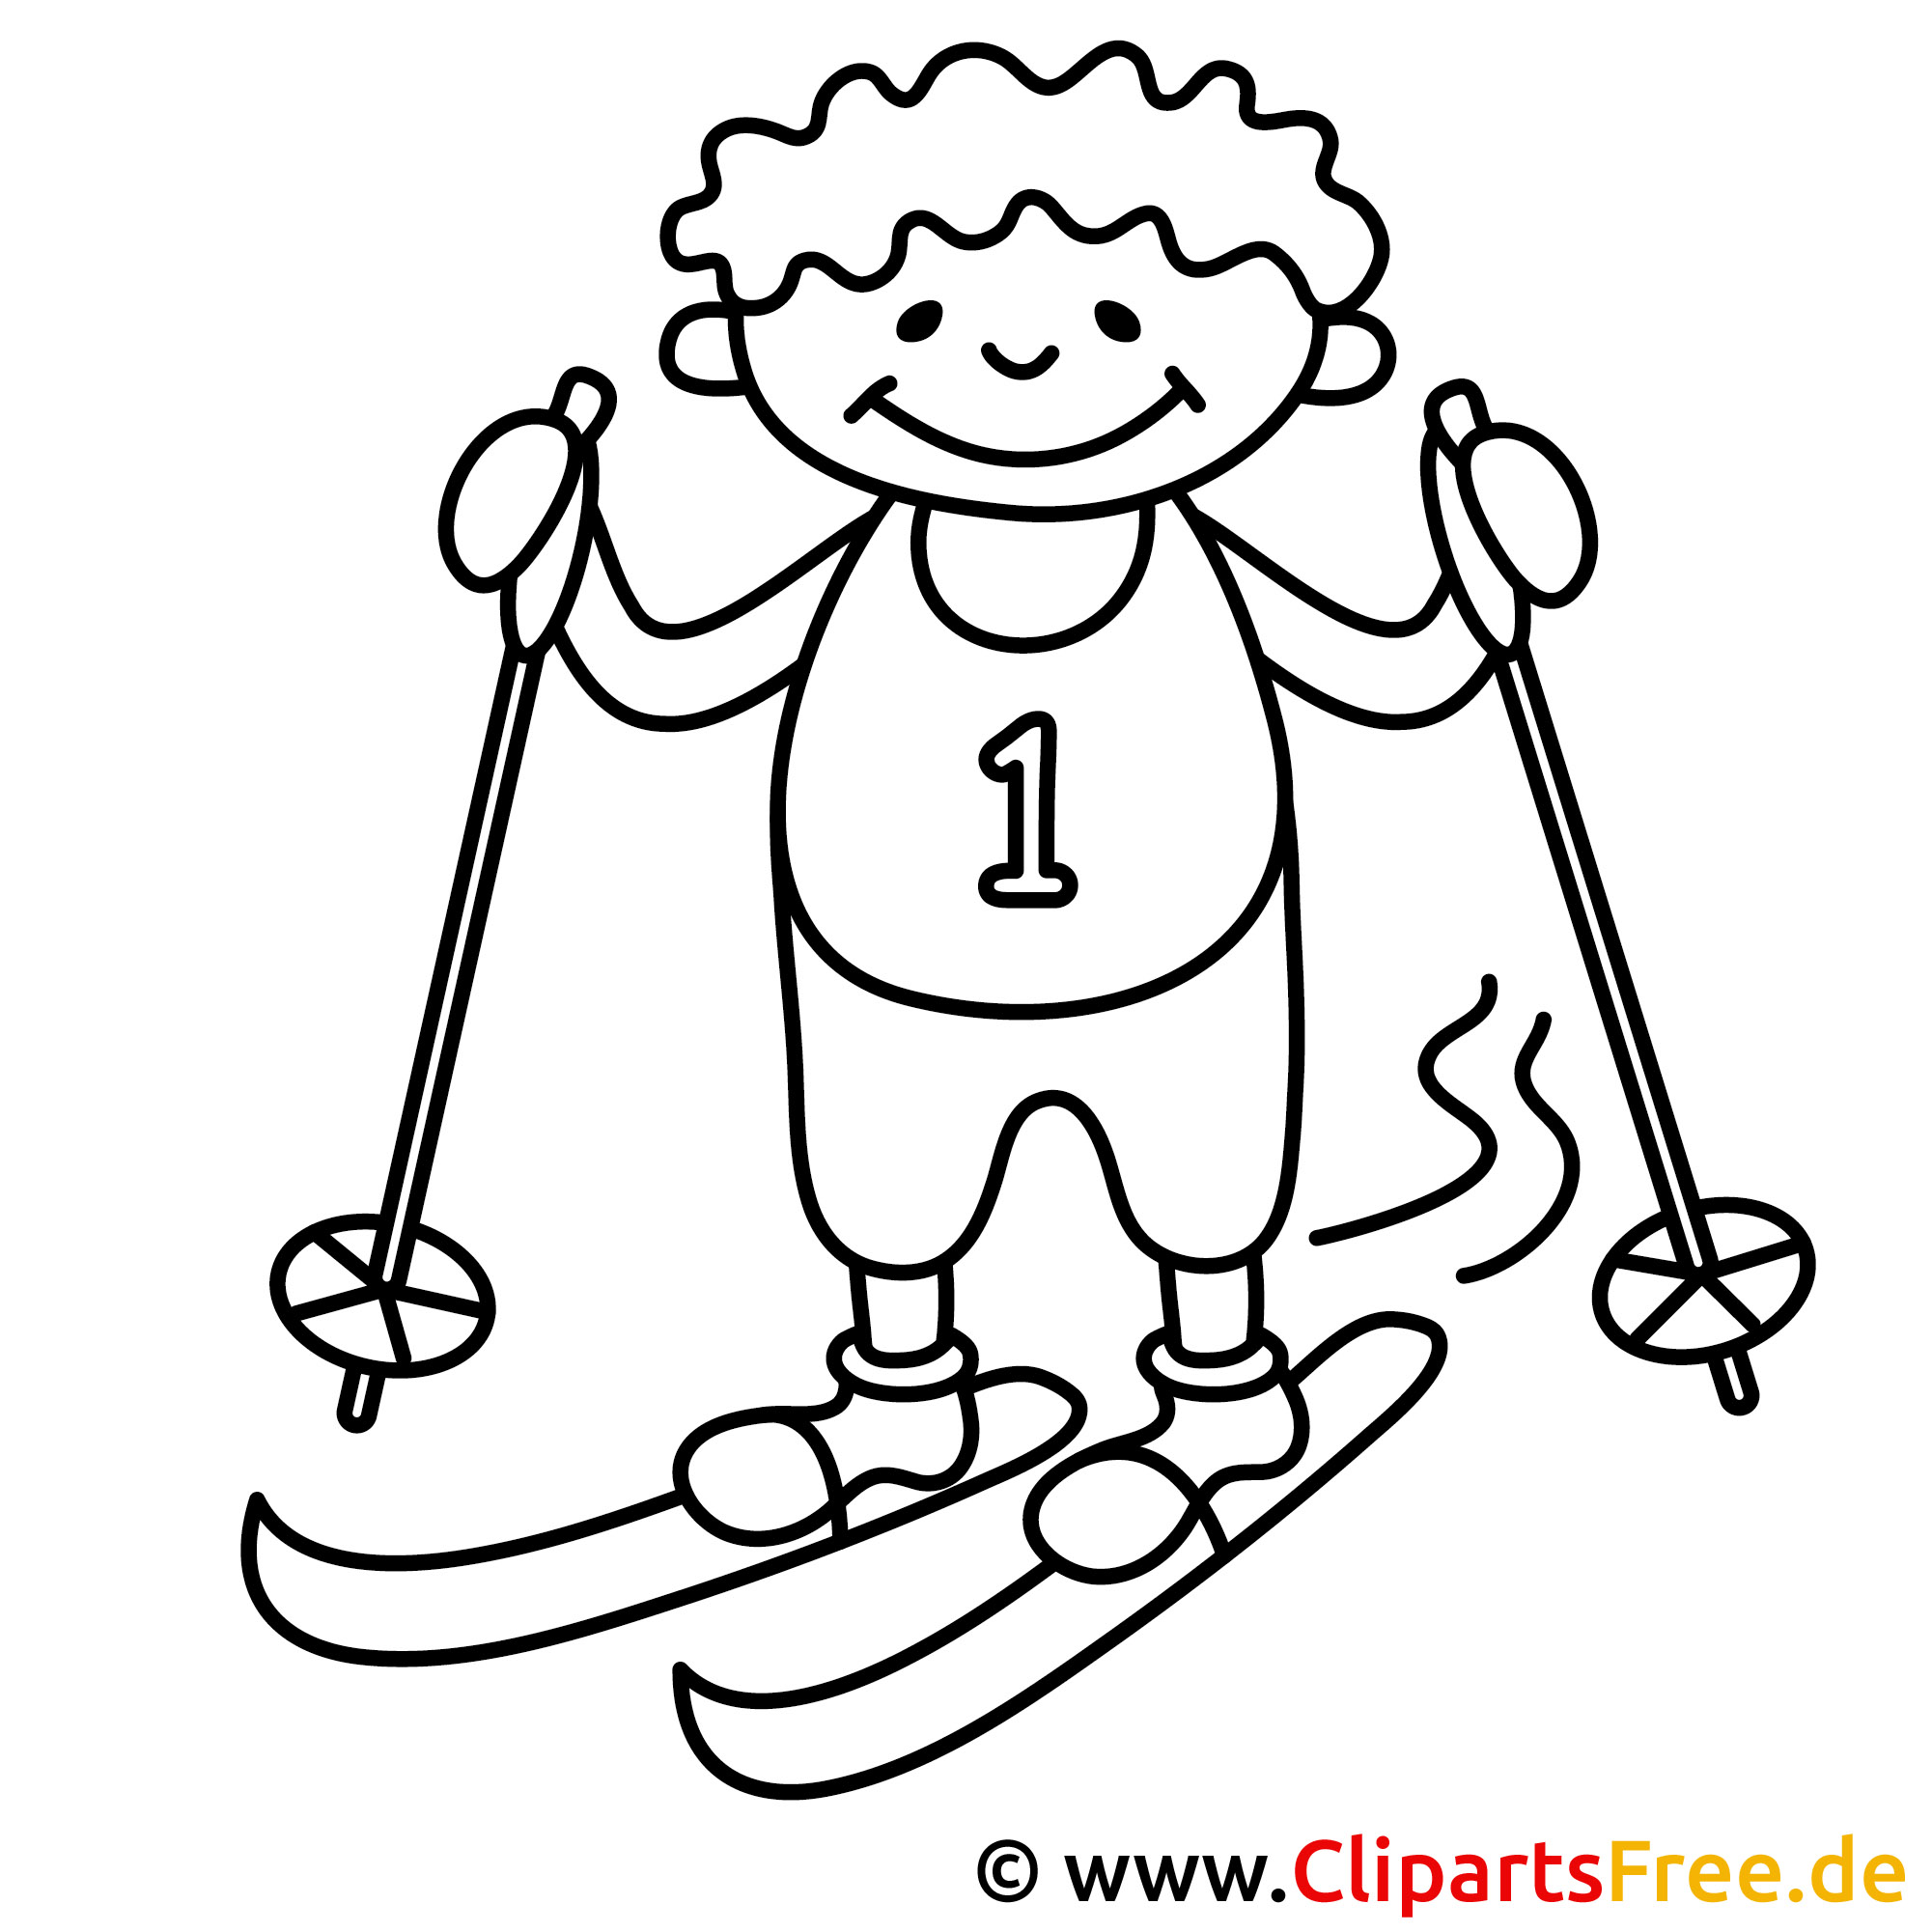 skifahrer malvorlage bild ausmalbild gratis